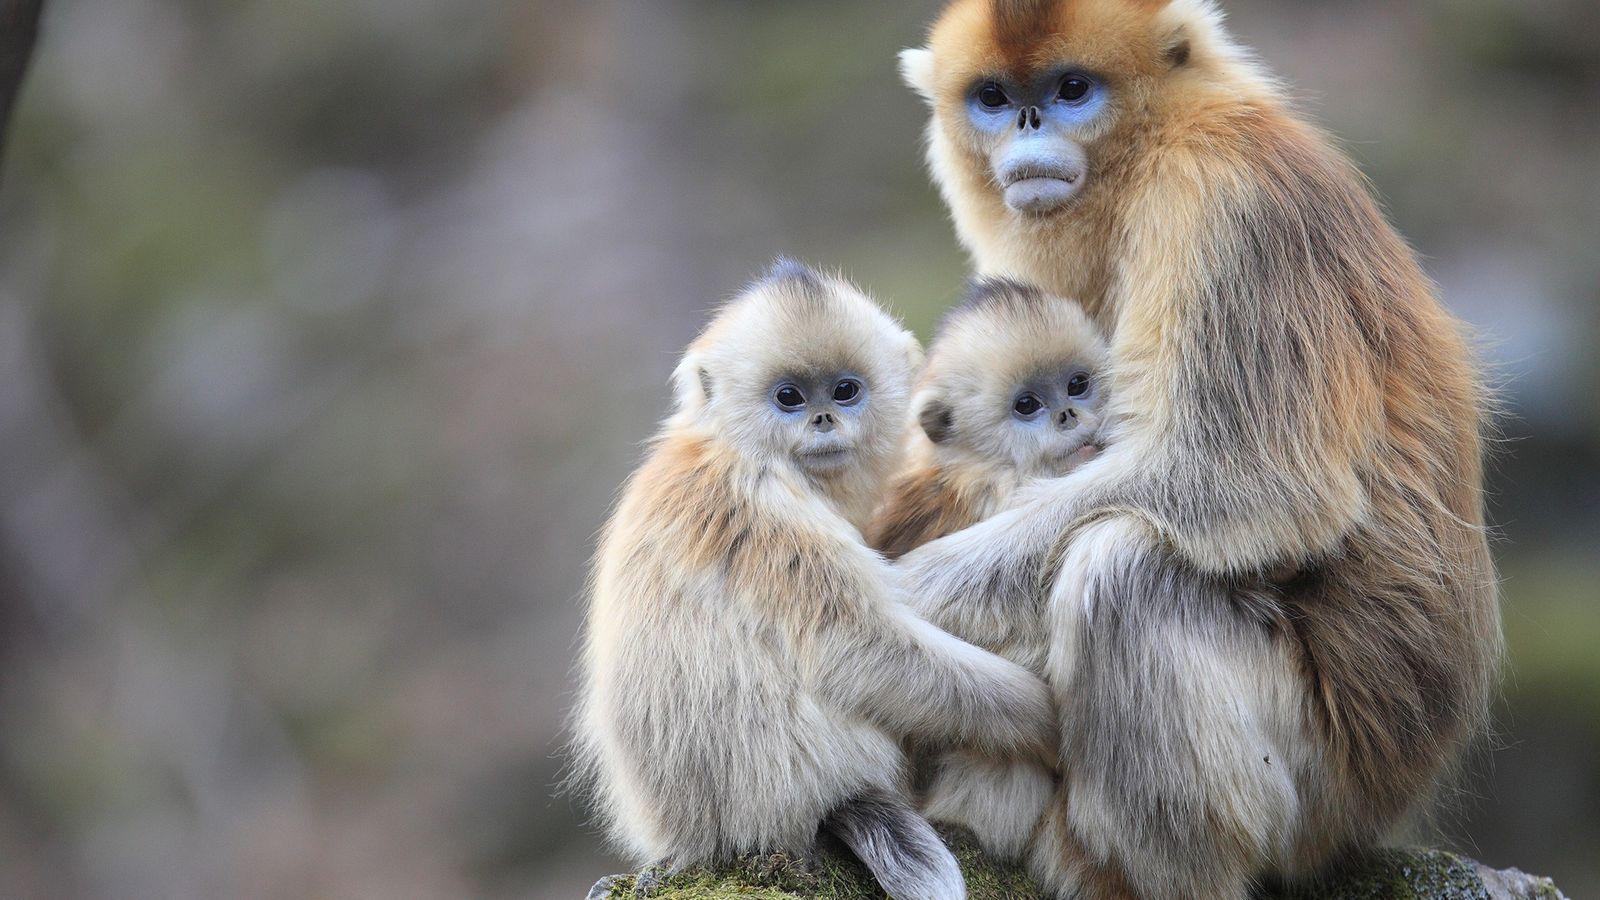 Monos langures chatos dorados